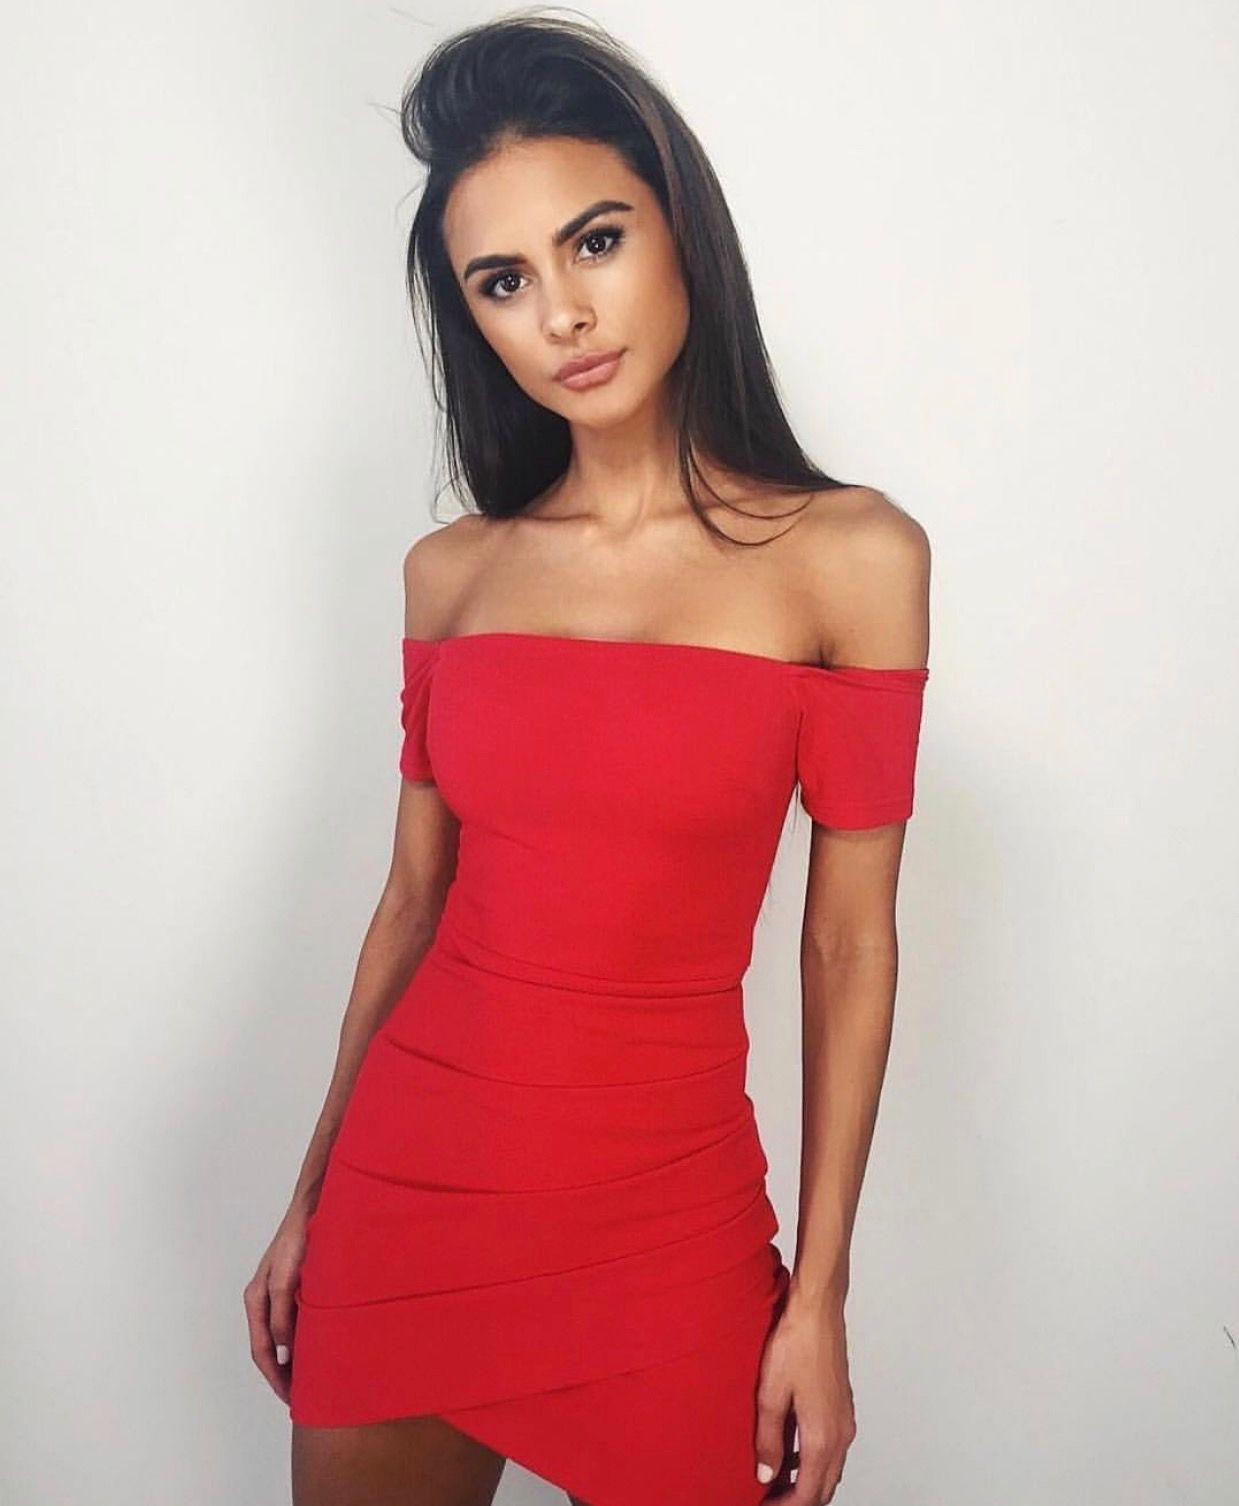 Goals pretty model red dress tight dress off the shoulder dress